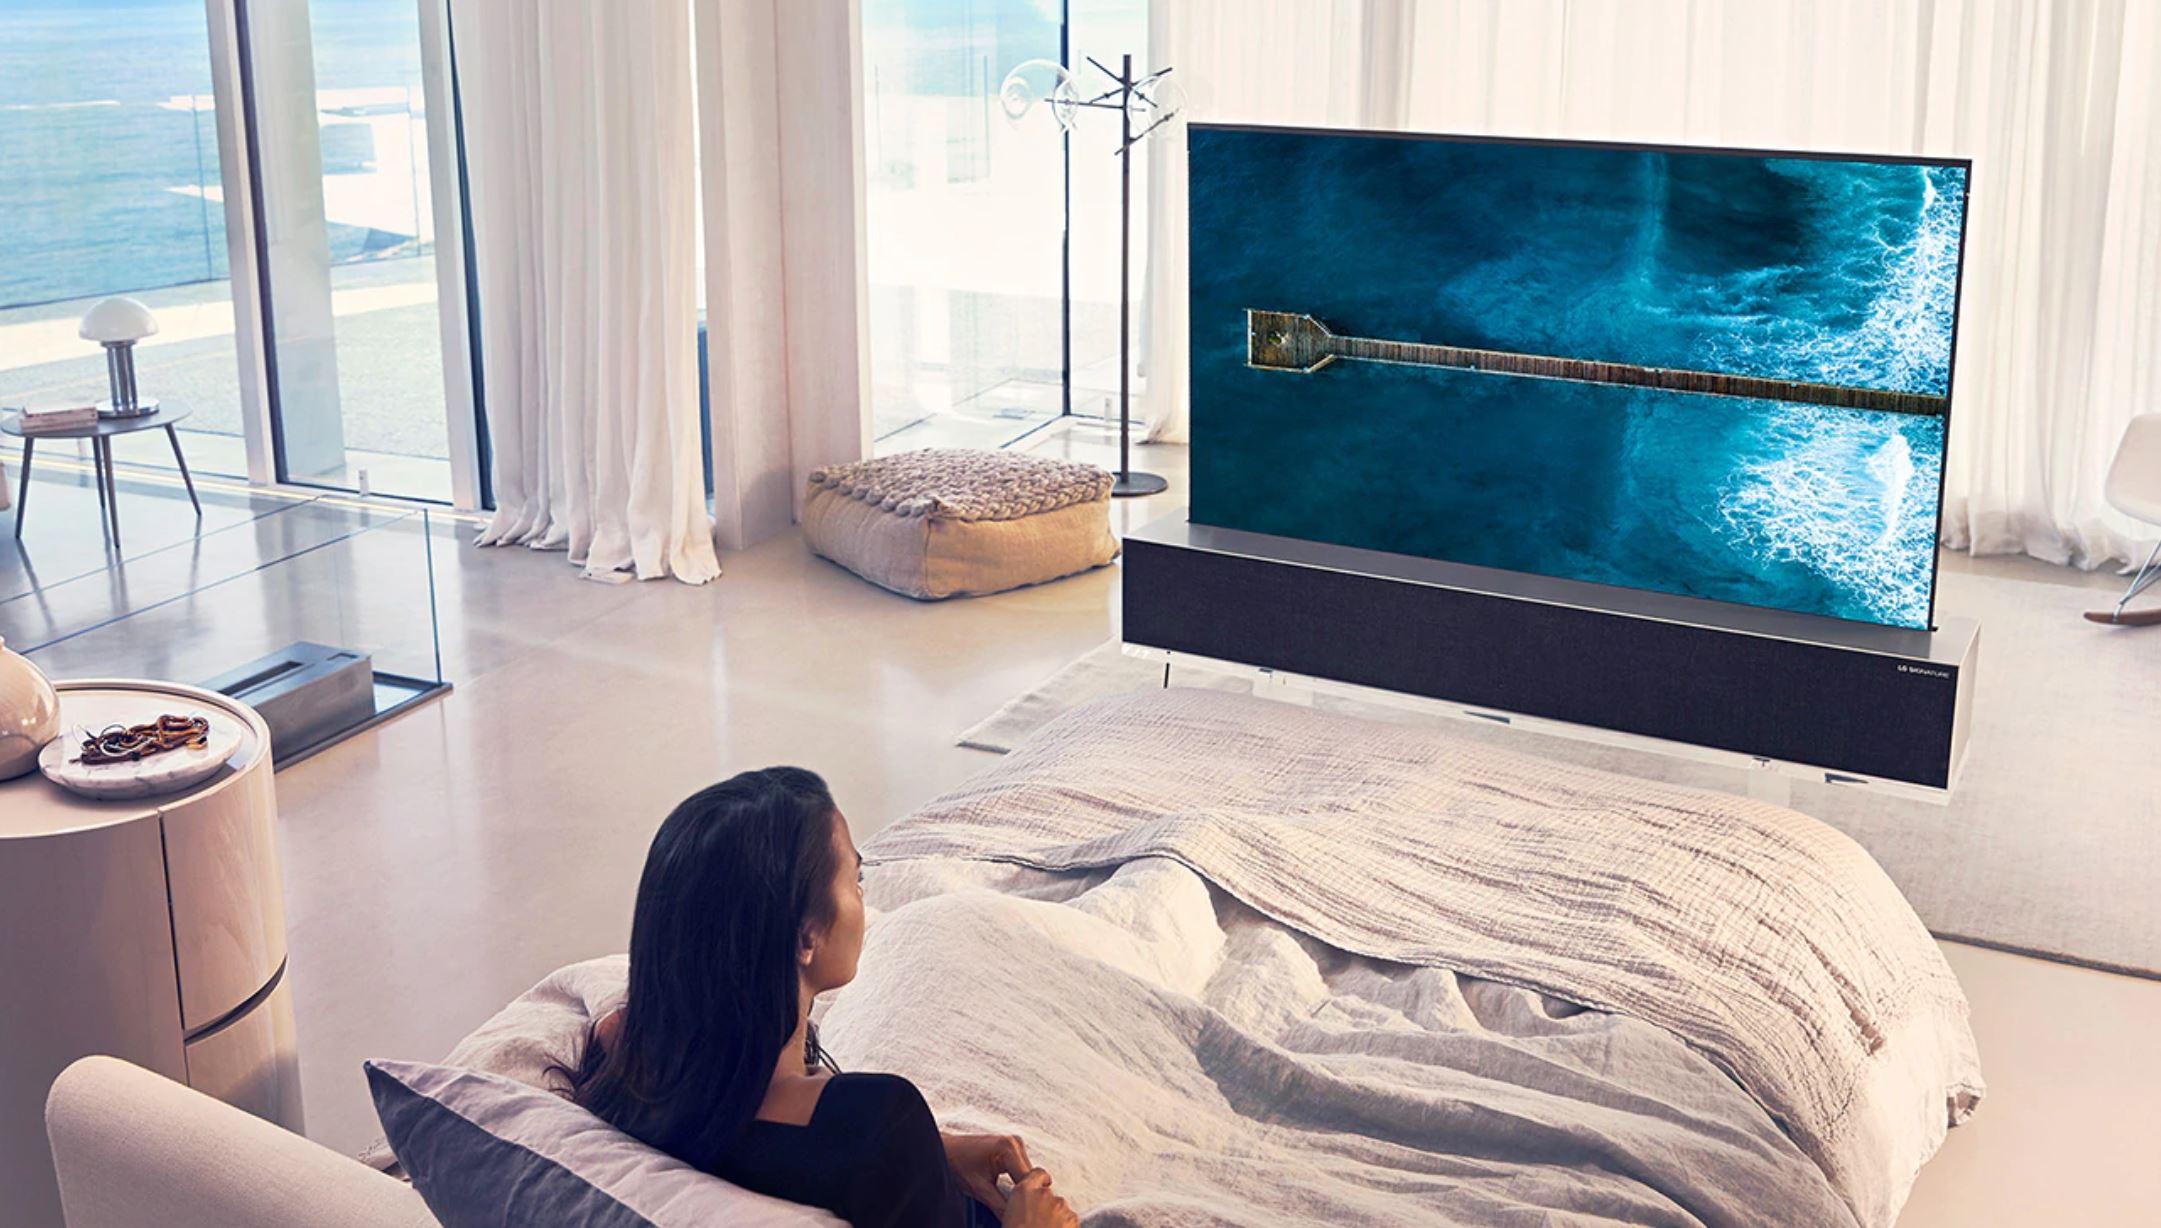 LG TV schermo arrotolabile